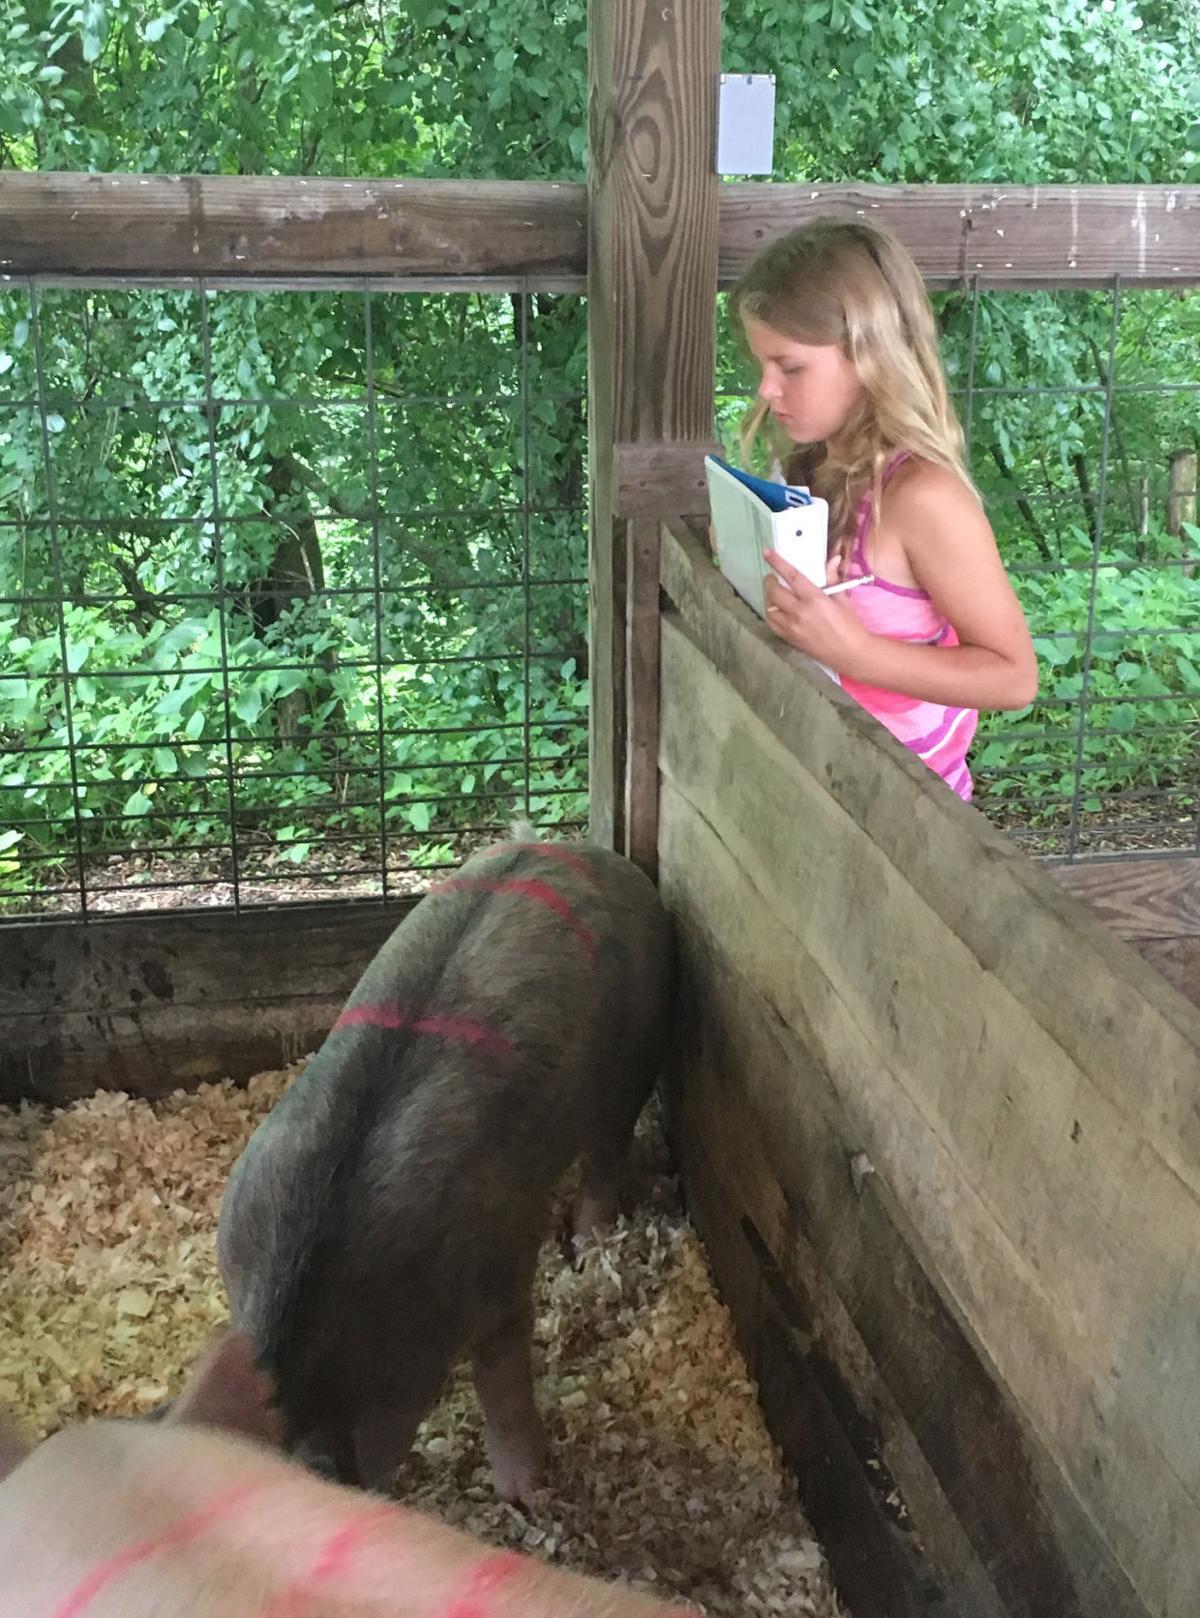 Pig judging